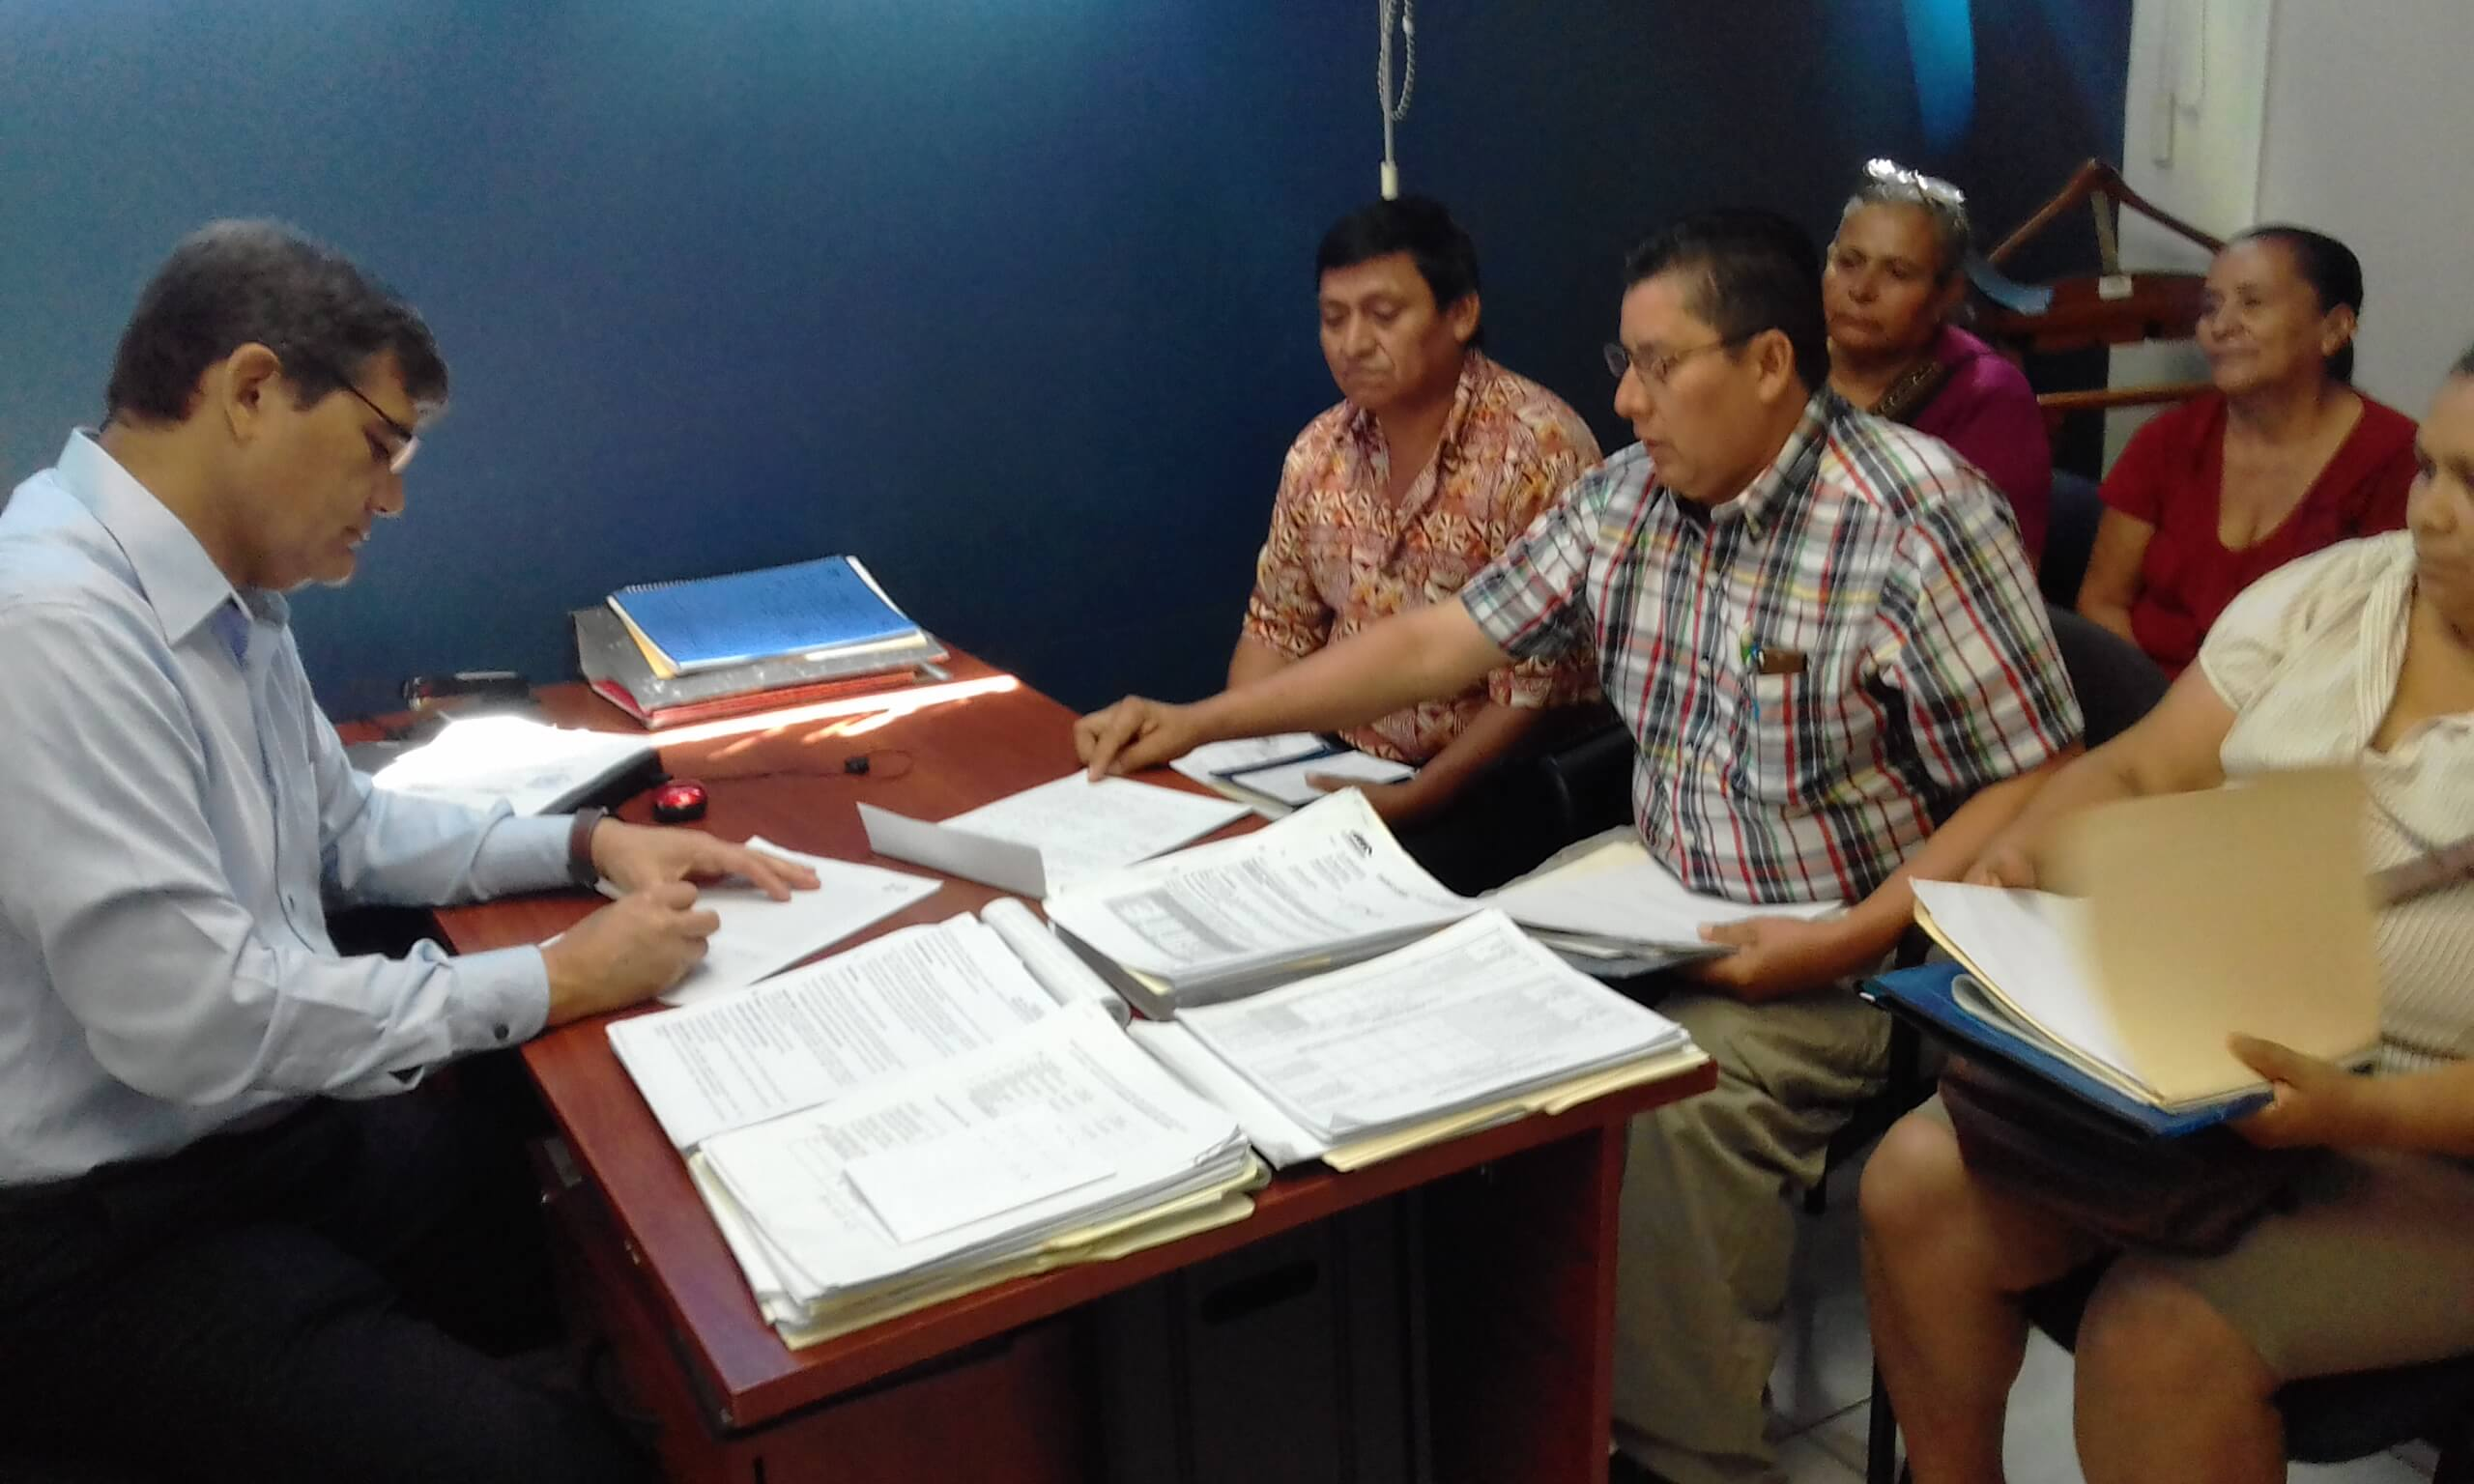 COFOA Leaders Meet With The Manager Of FODAVIPO Regarding Faulty Property Deeds In Rosario